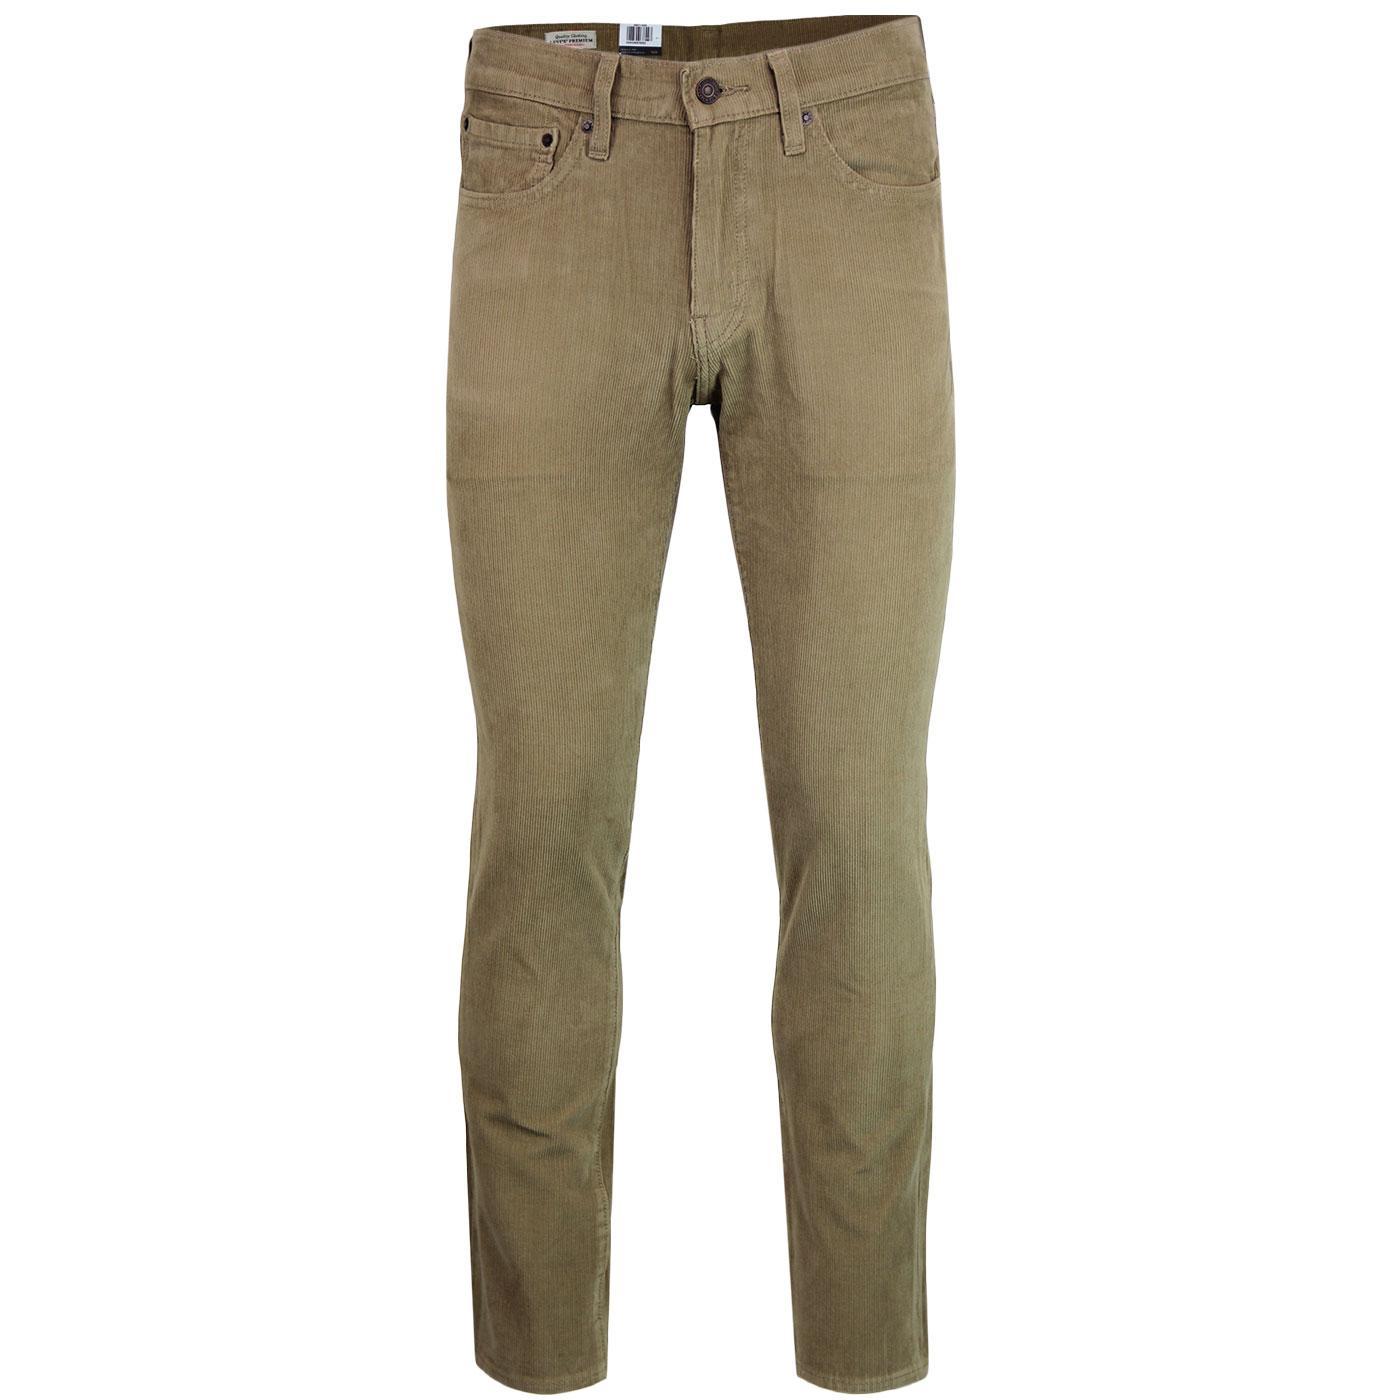 LEVI'S 511 Retro Mod Slim Cord Jeans (Lead Grey)